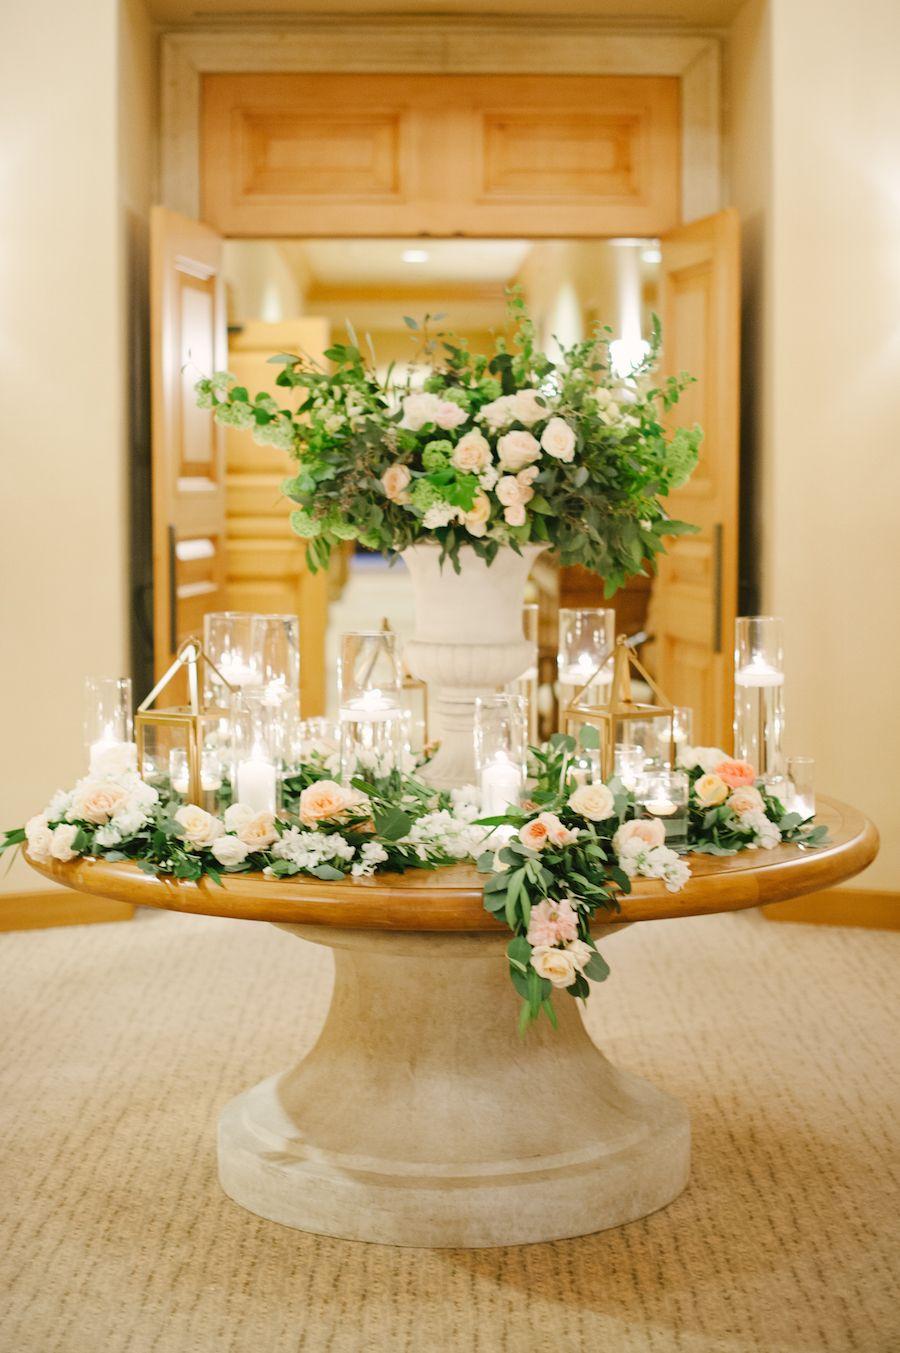 California Pastel GardenInspired Wedding Candle decor